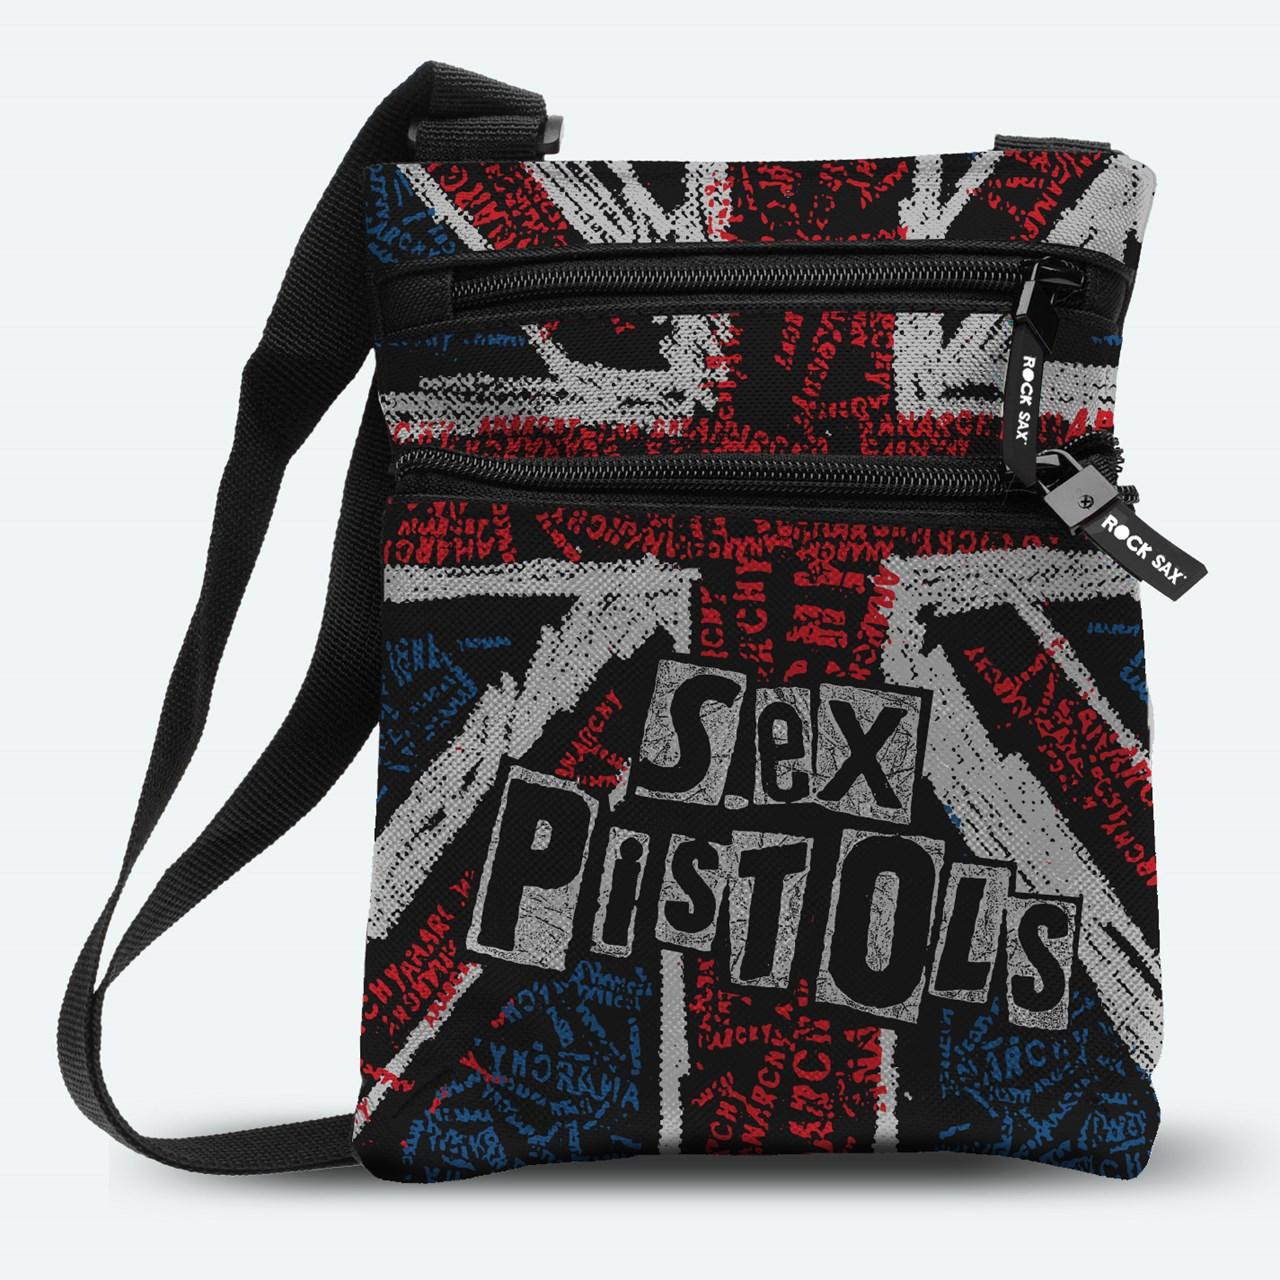 Sex Pistols: Union Jack Body Bag - 1